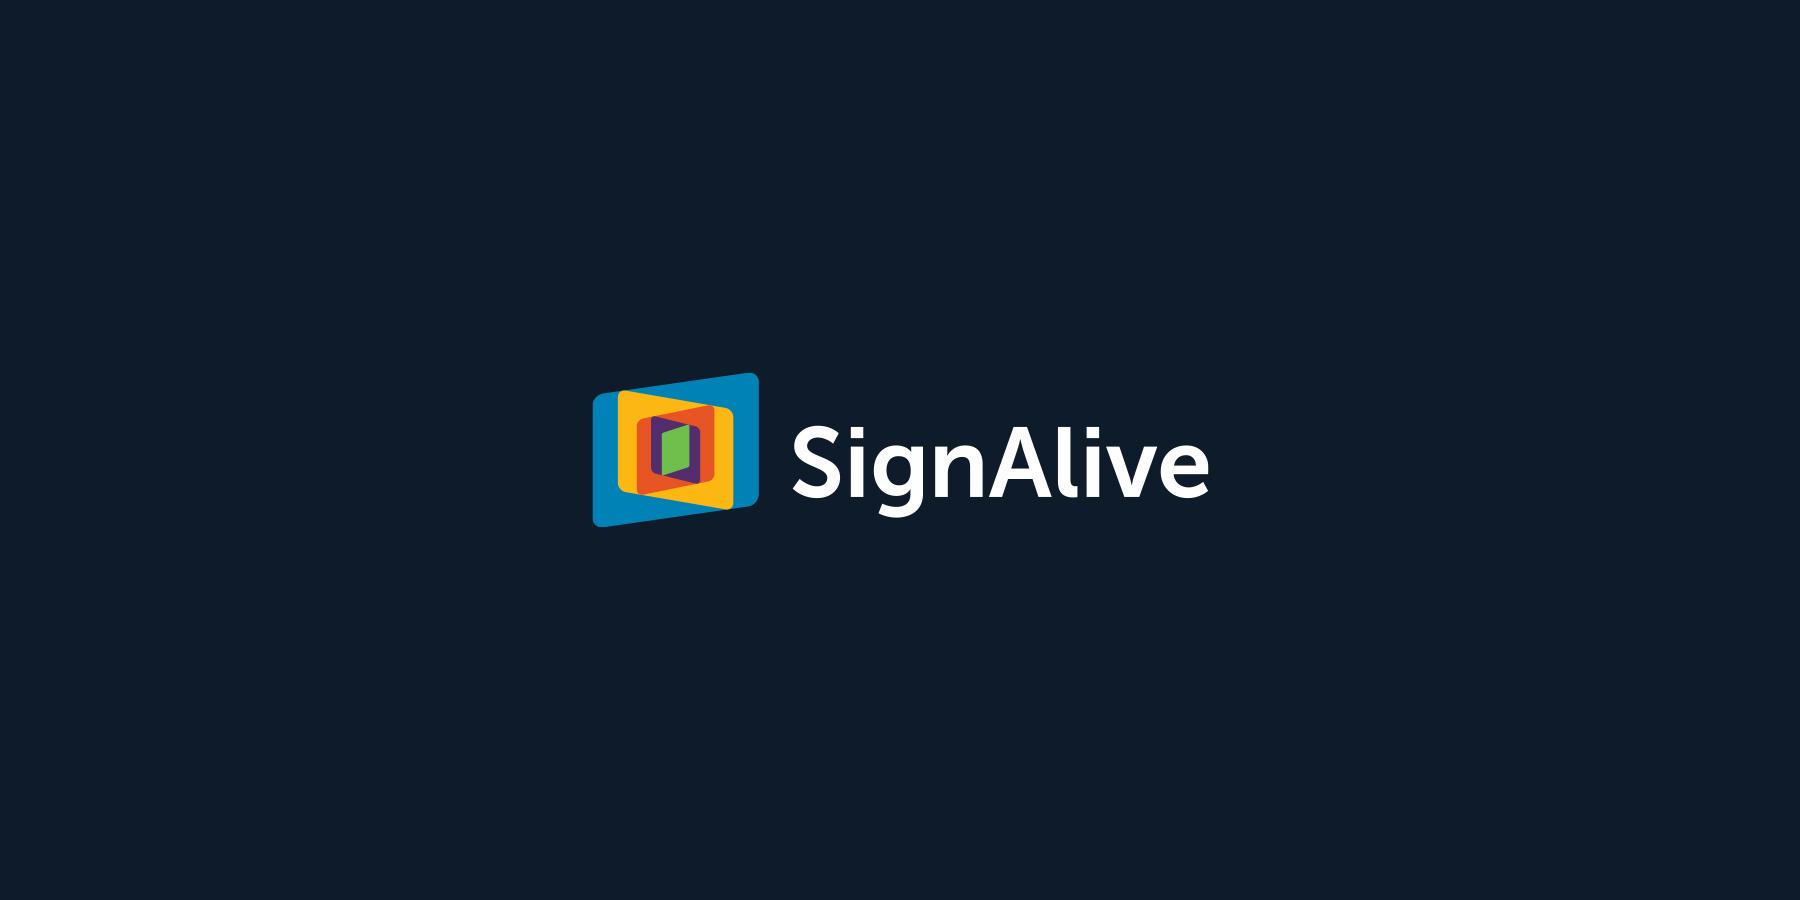 signalive-logo-design-01